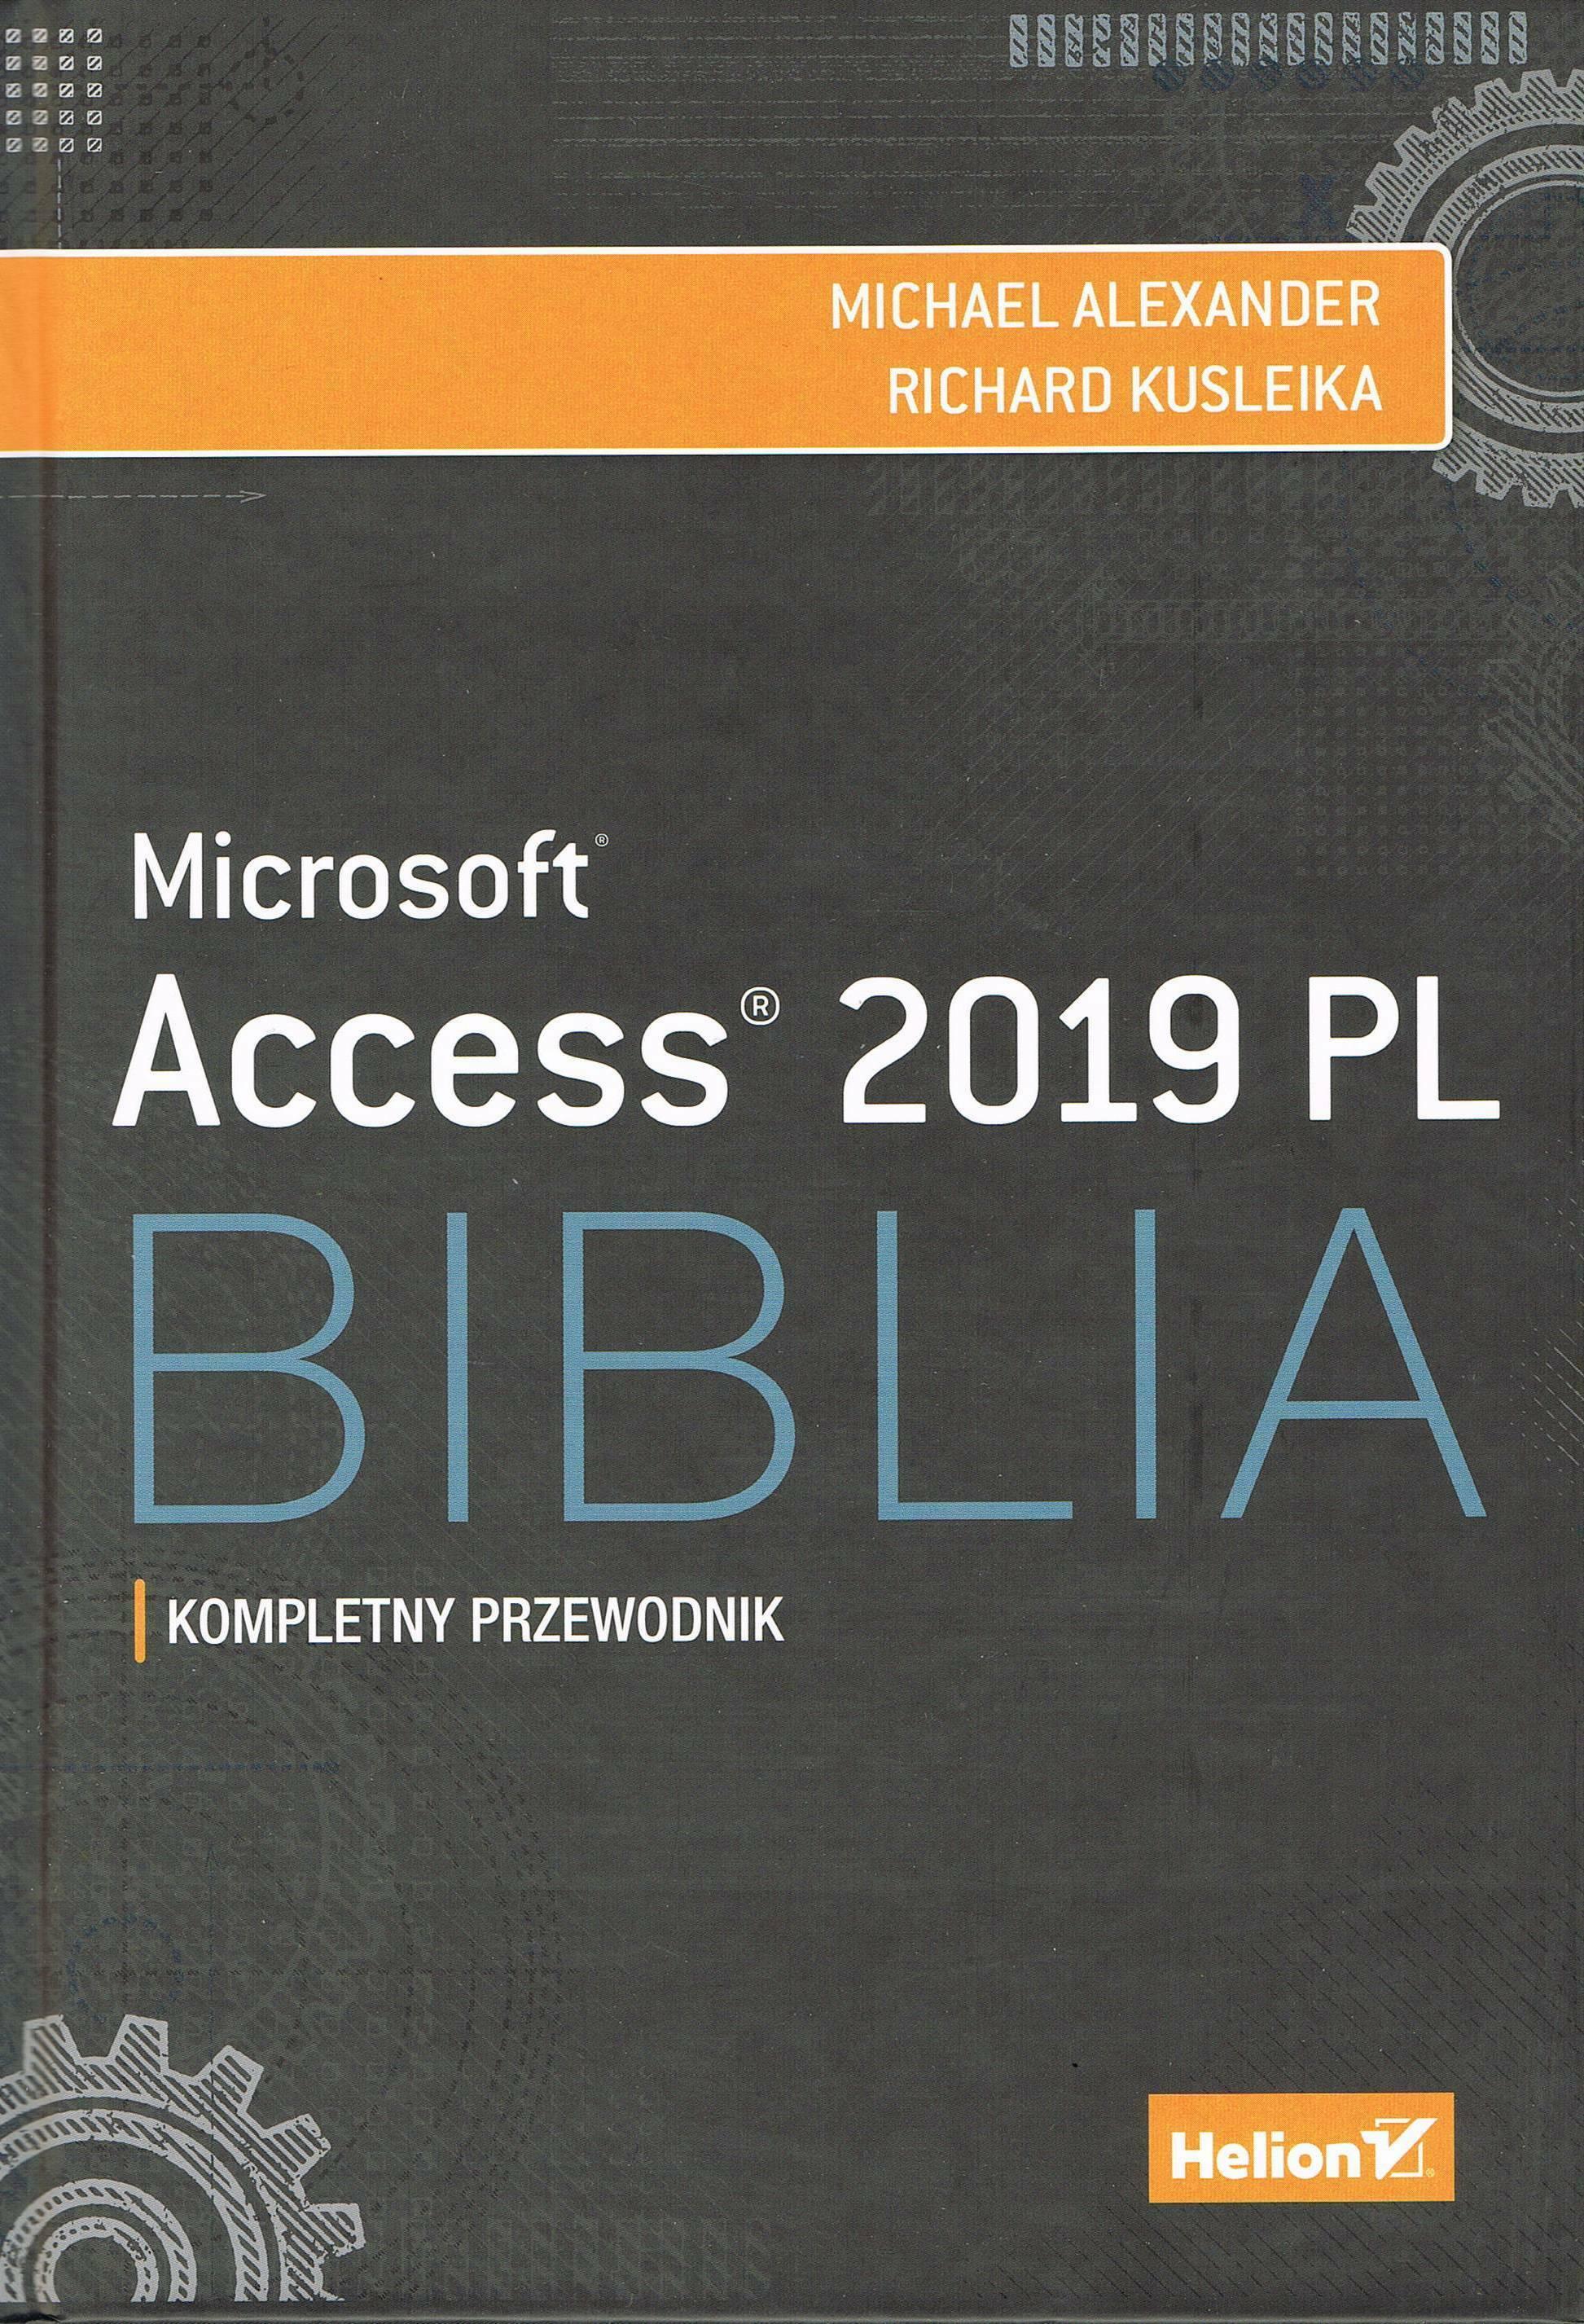 Access 2019 PL. Biblia.